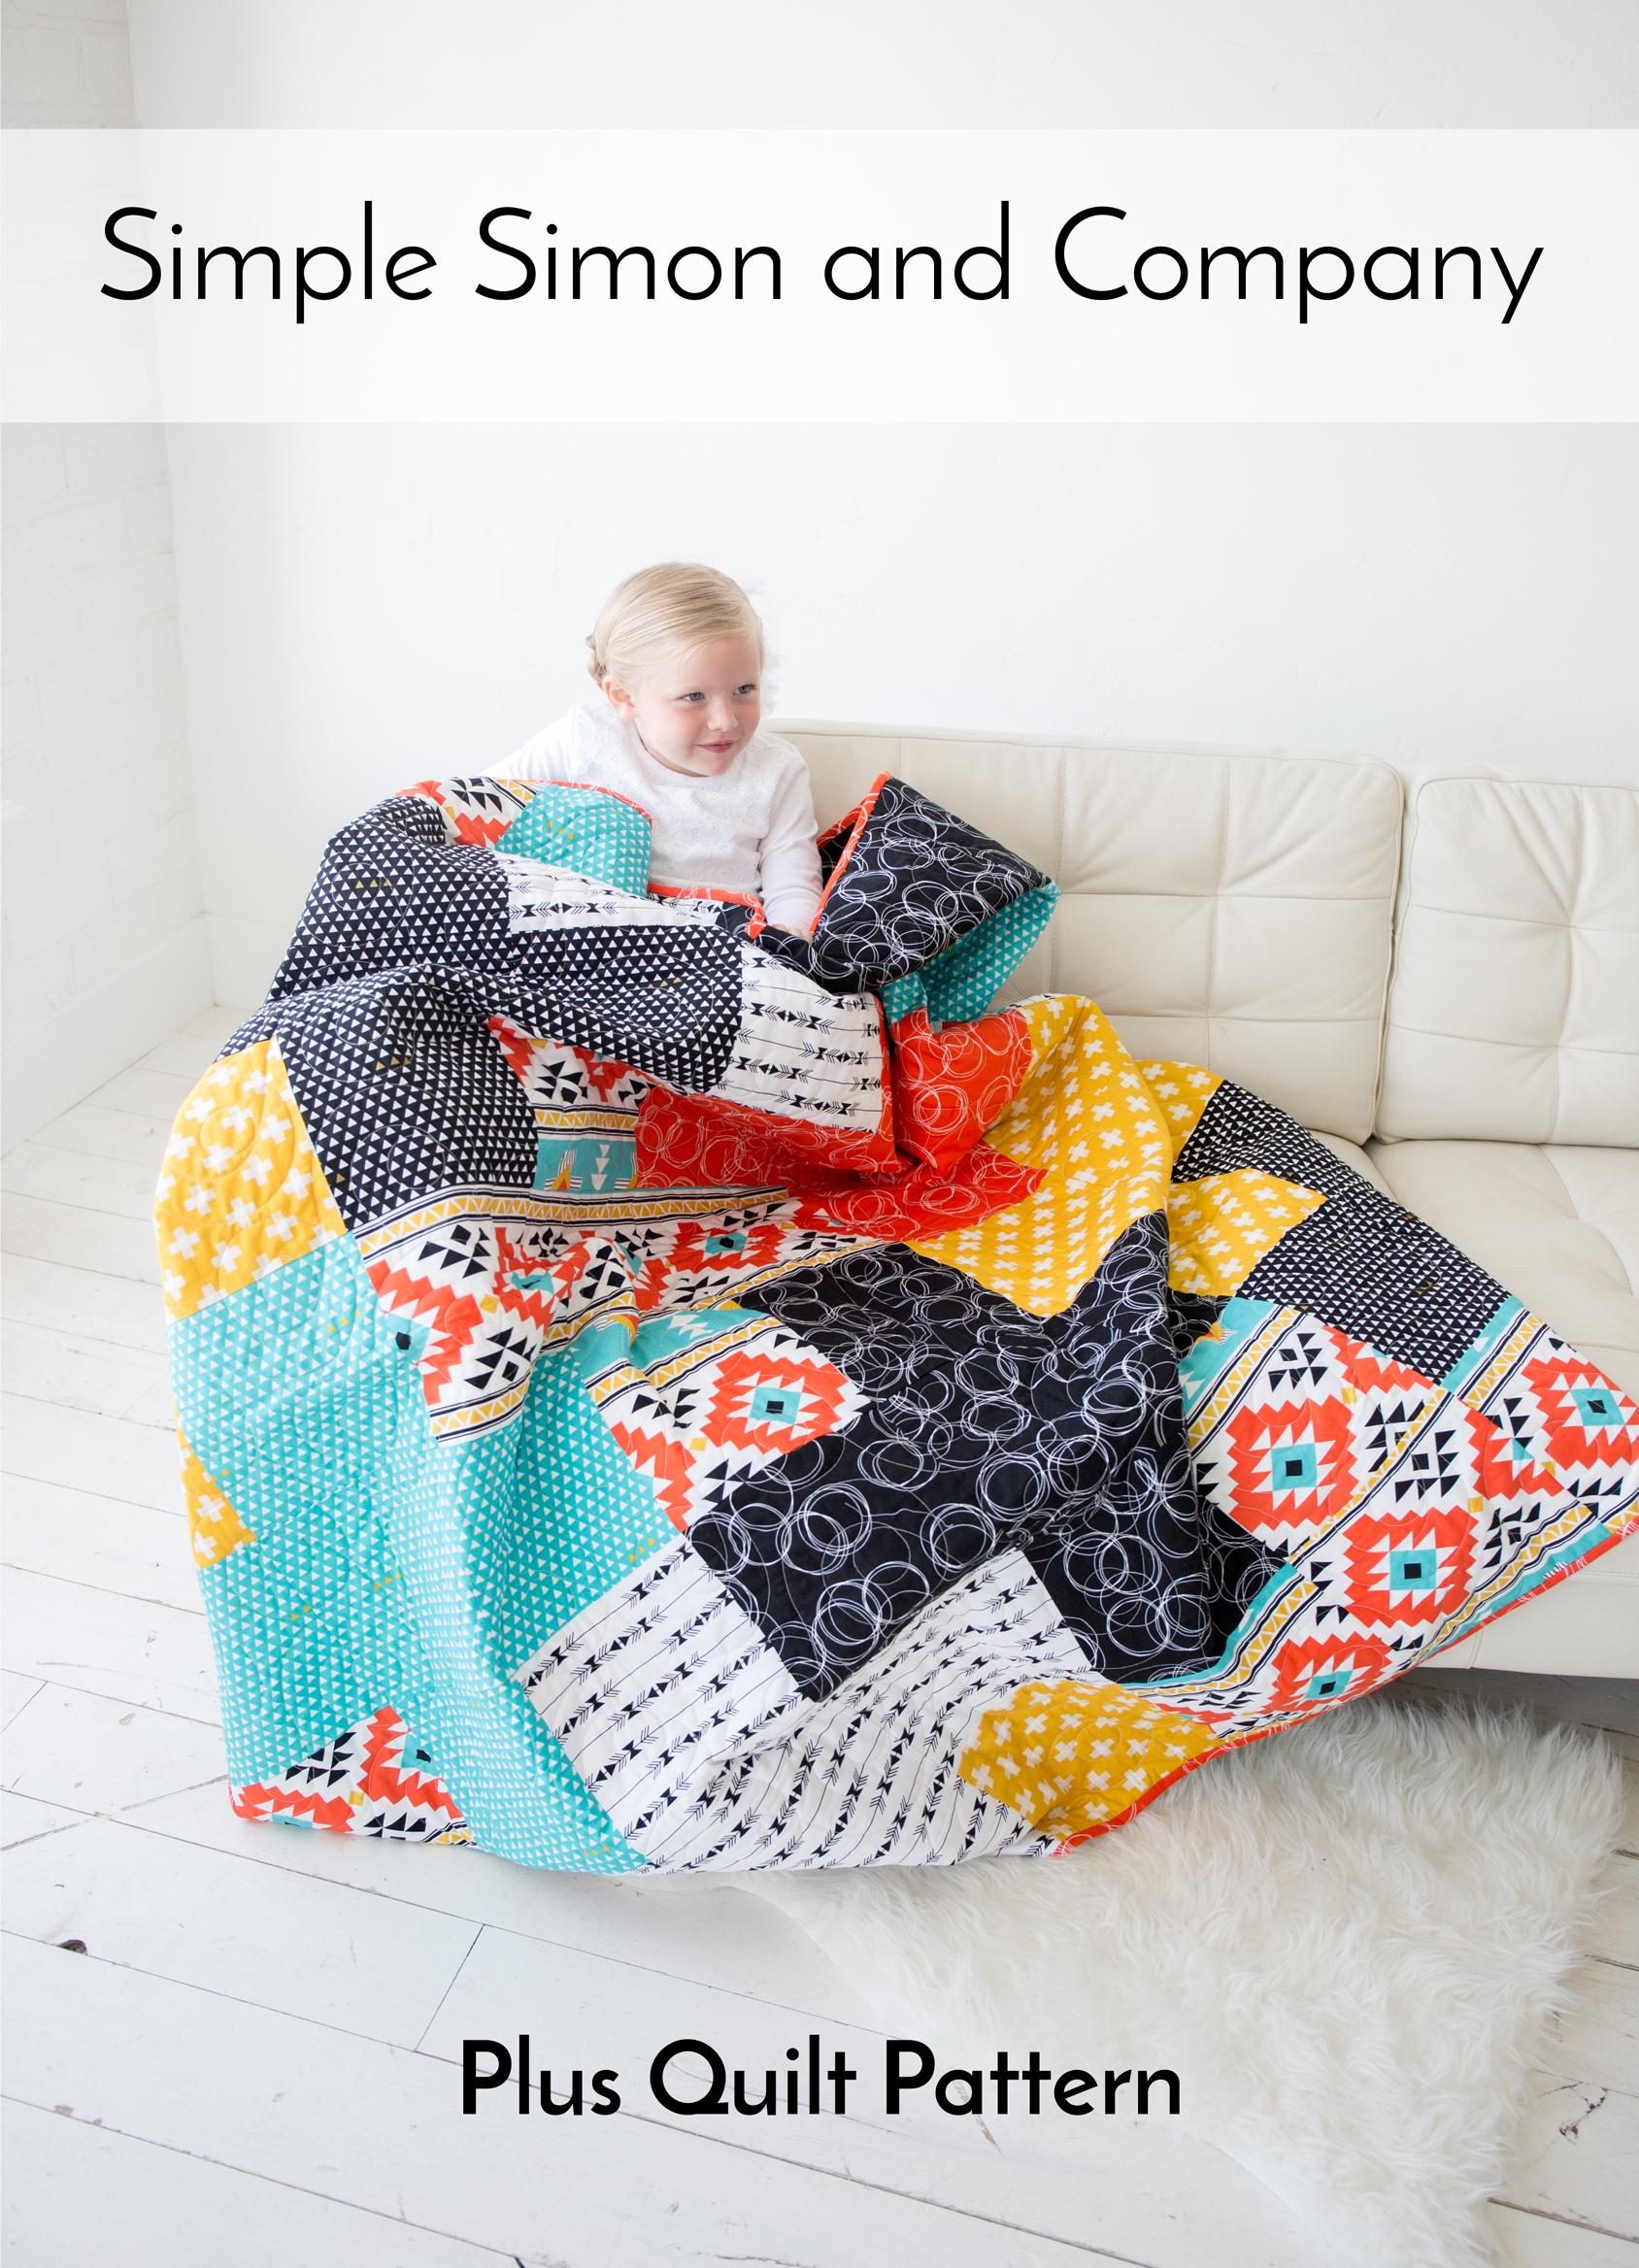 Plus Quilt Pattern Release